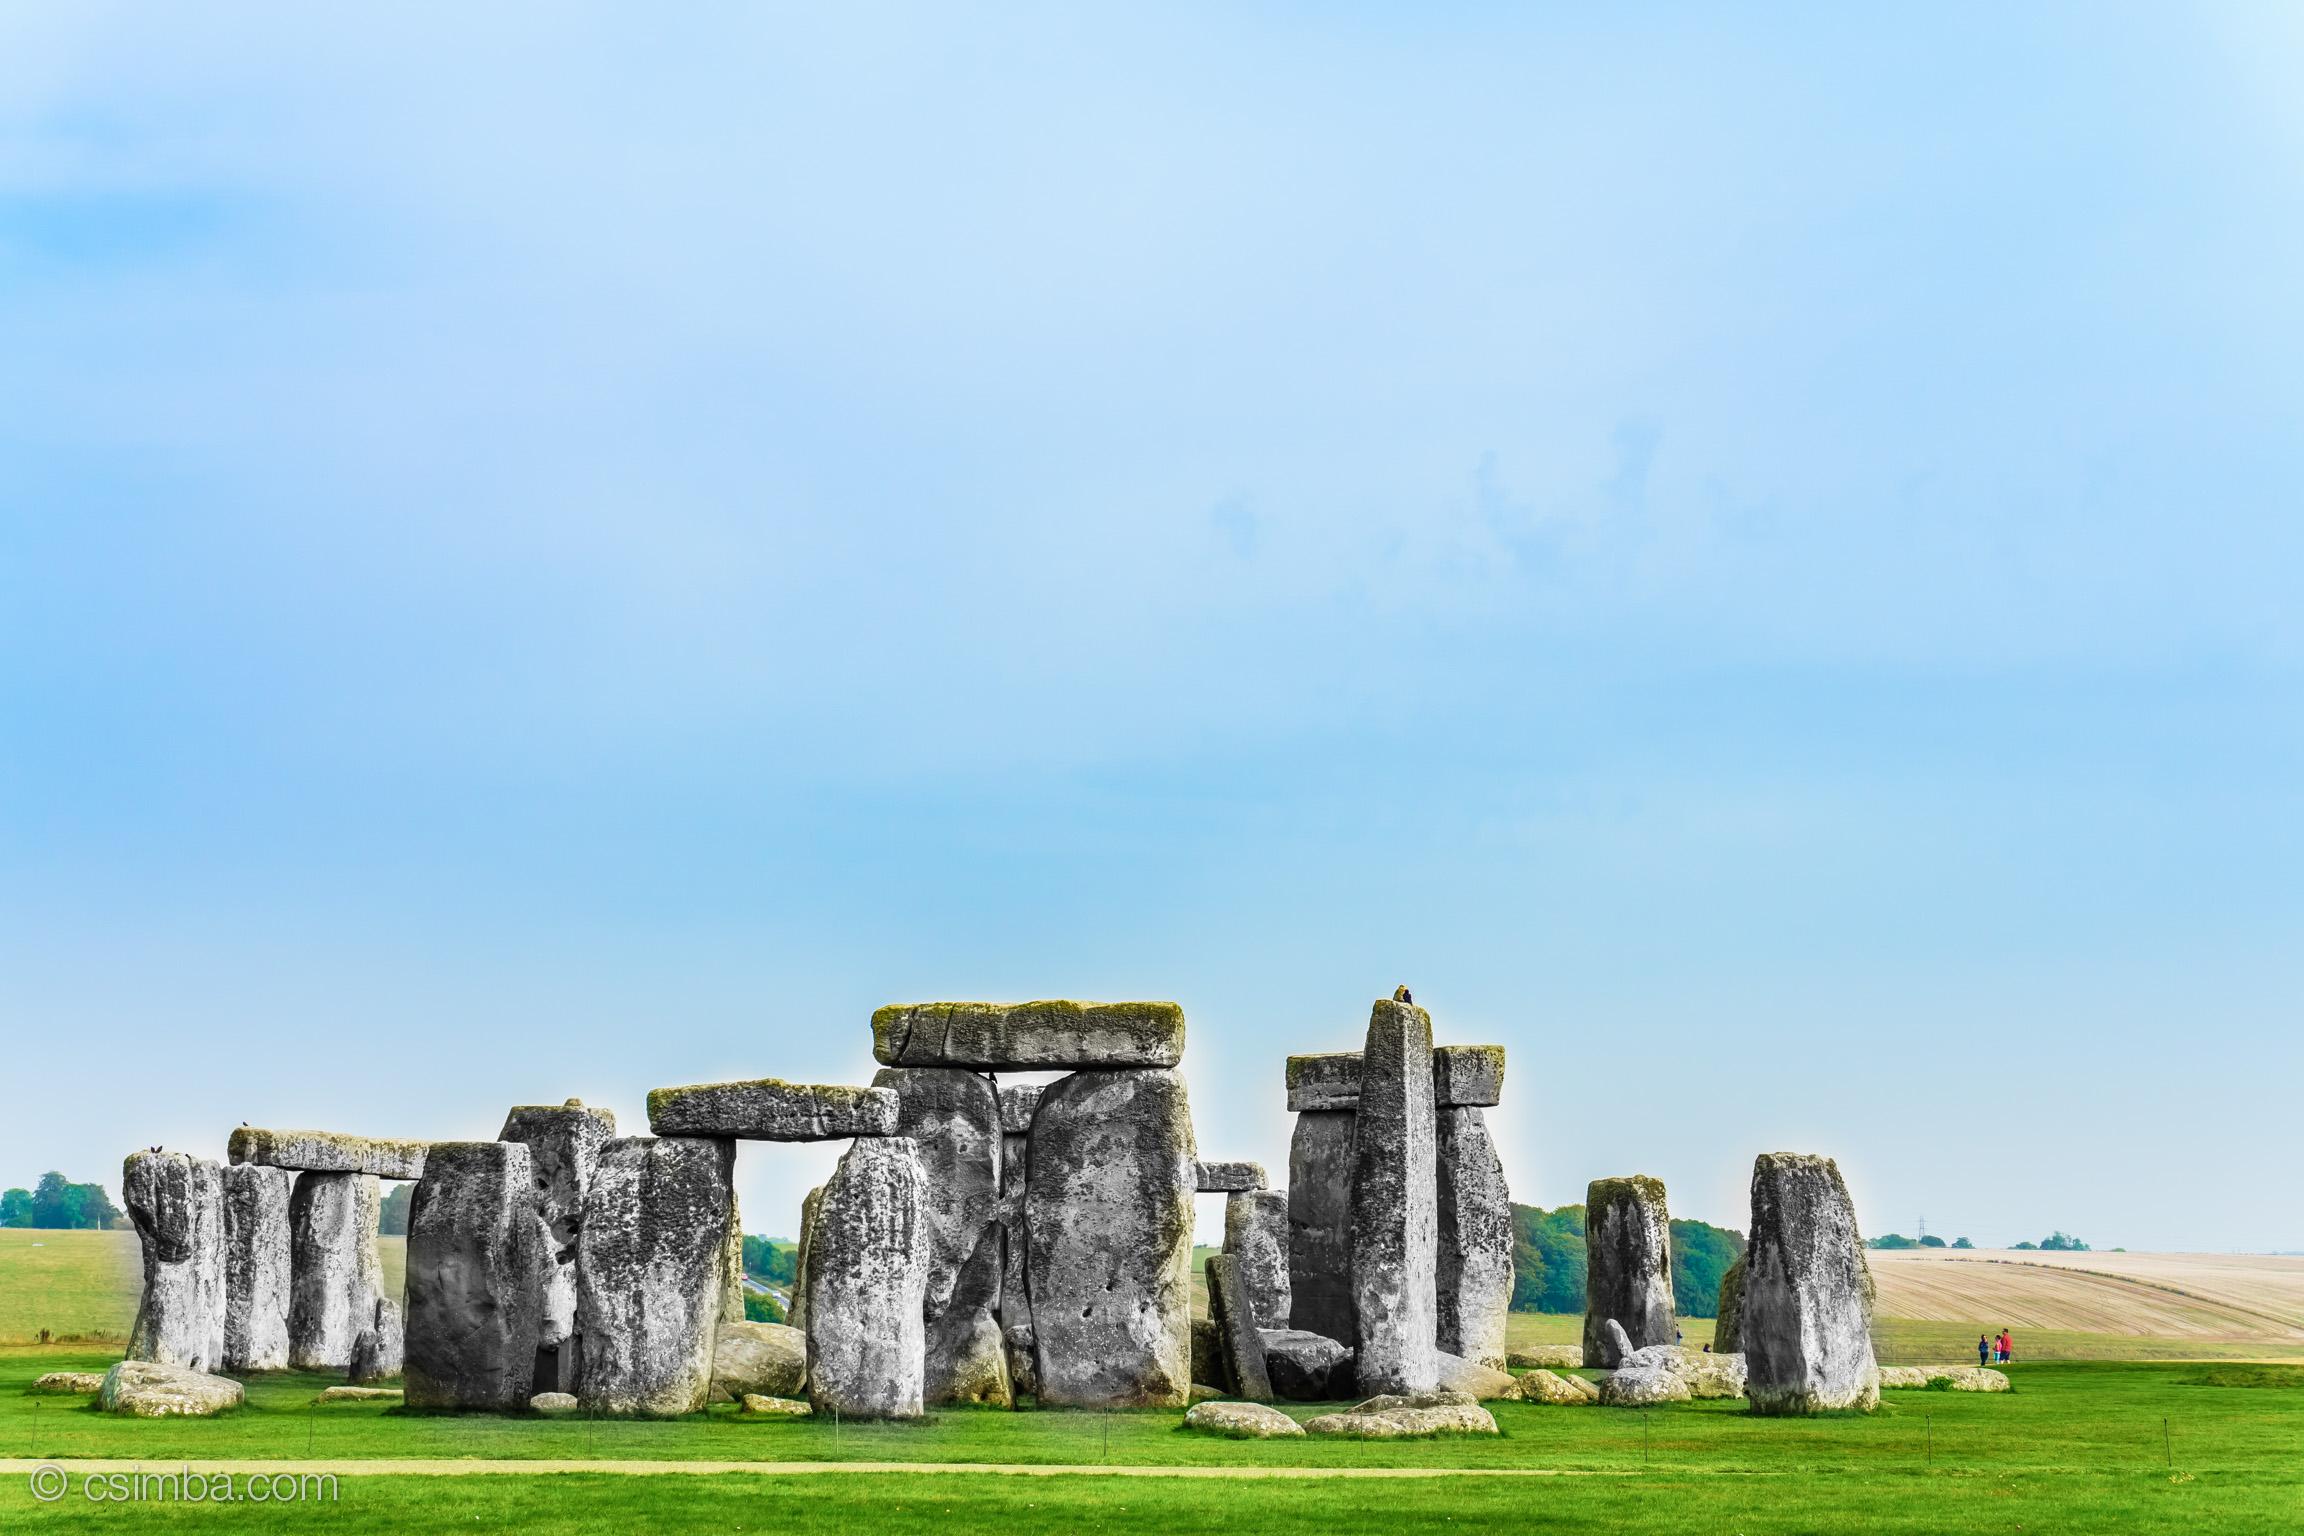 20140916-17 Bath&巨石阵